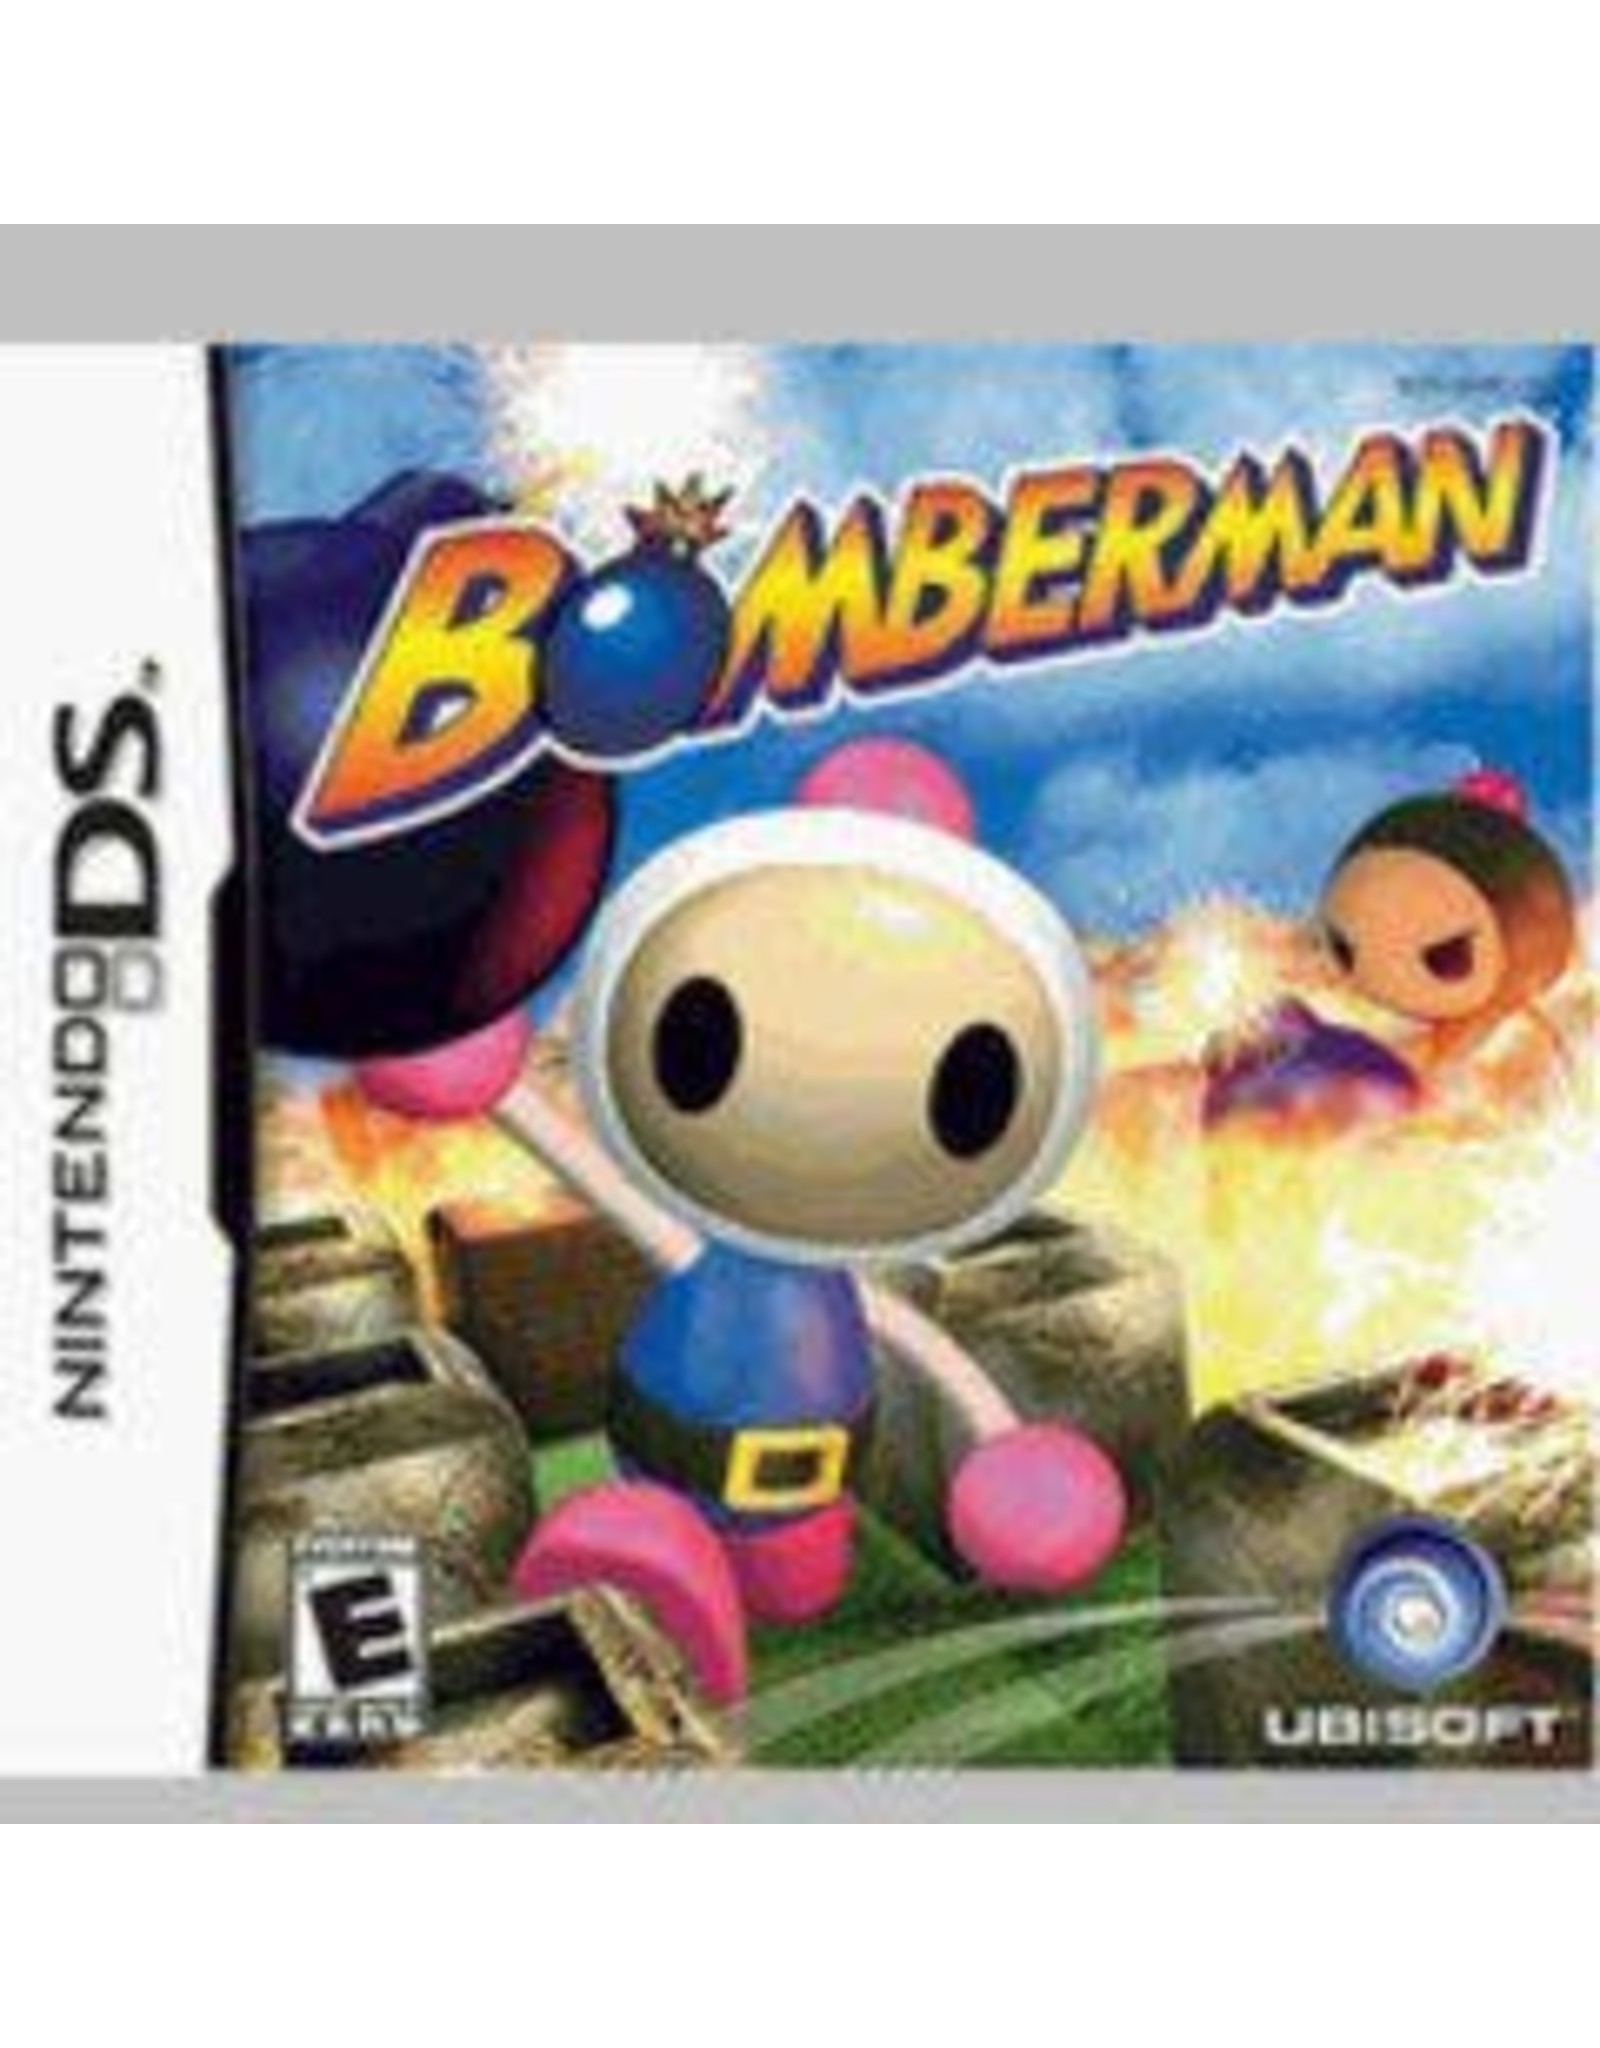 Nintendo DS Bomberman (CiB)